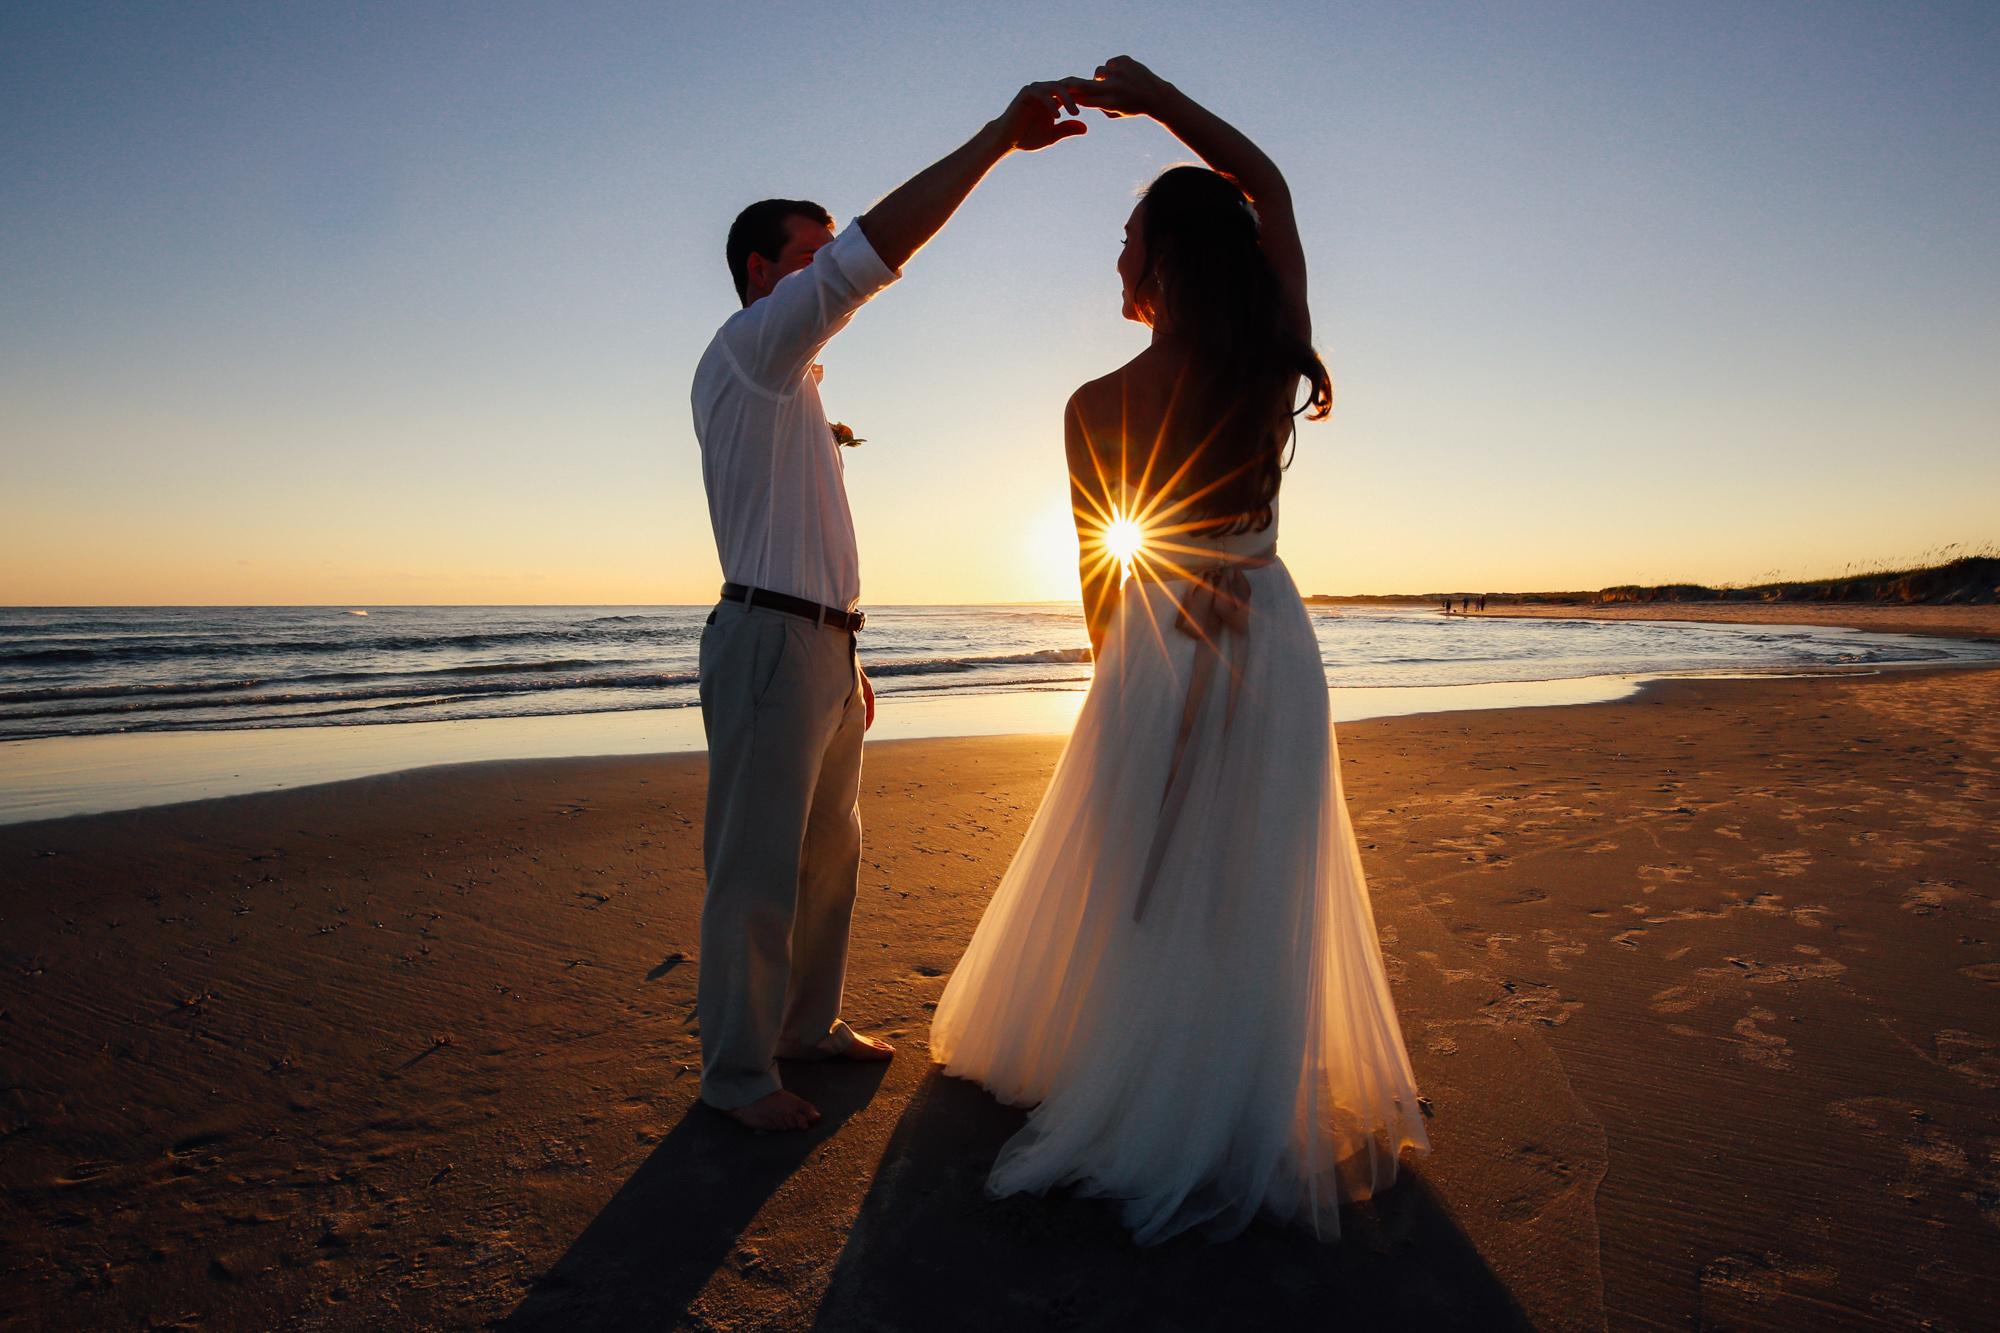 wedding-beachdance (1 of 1).jpg